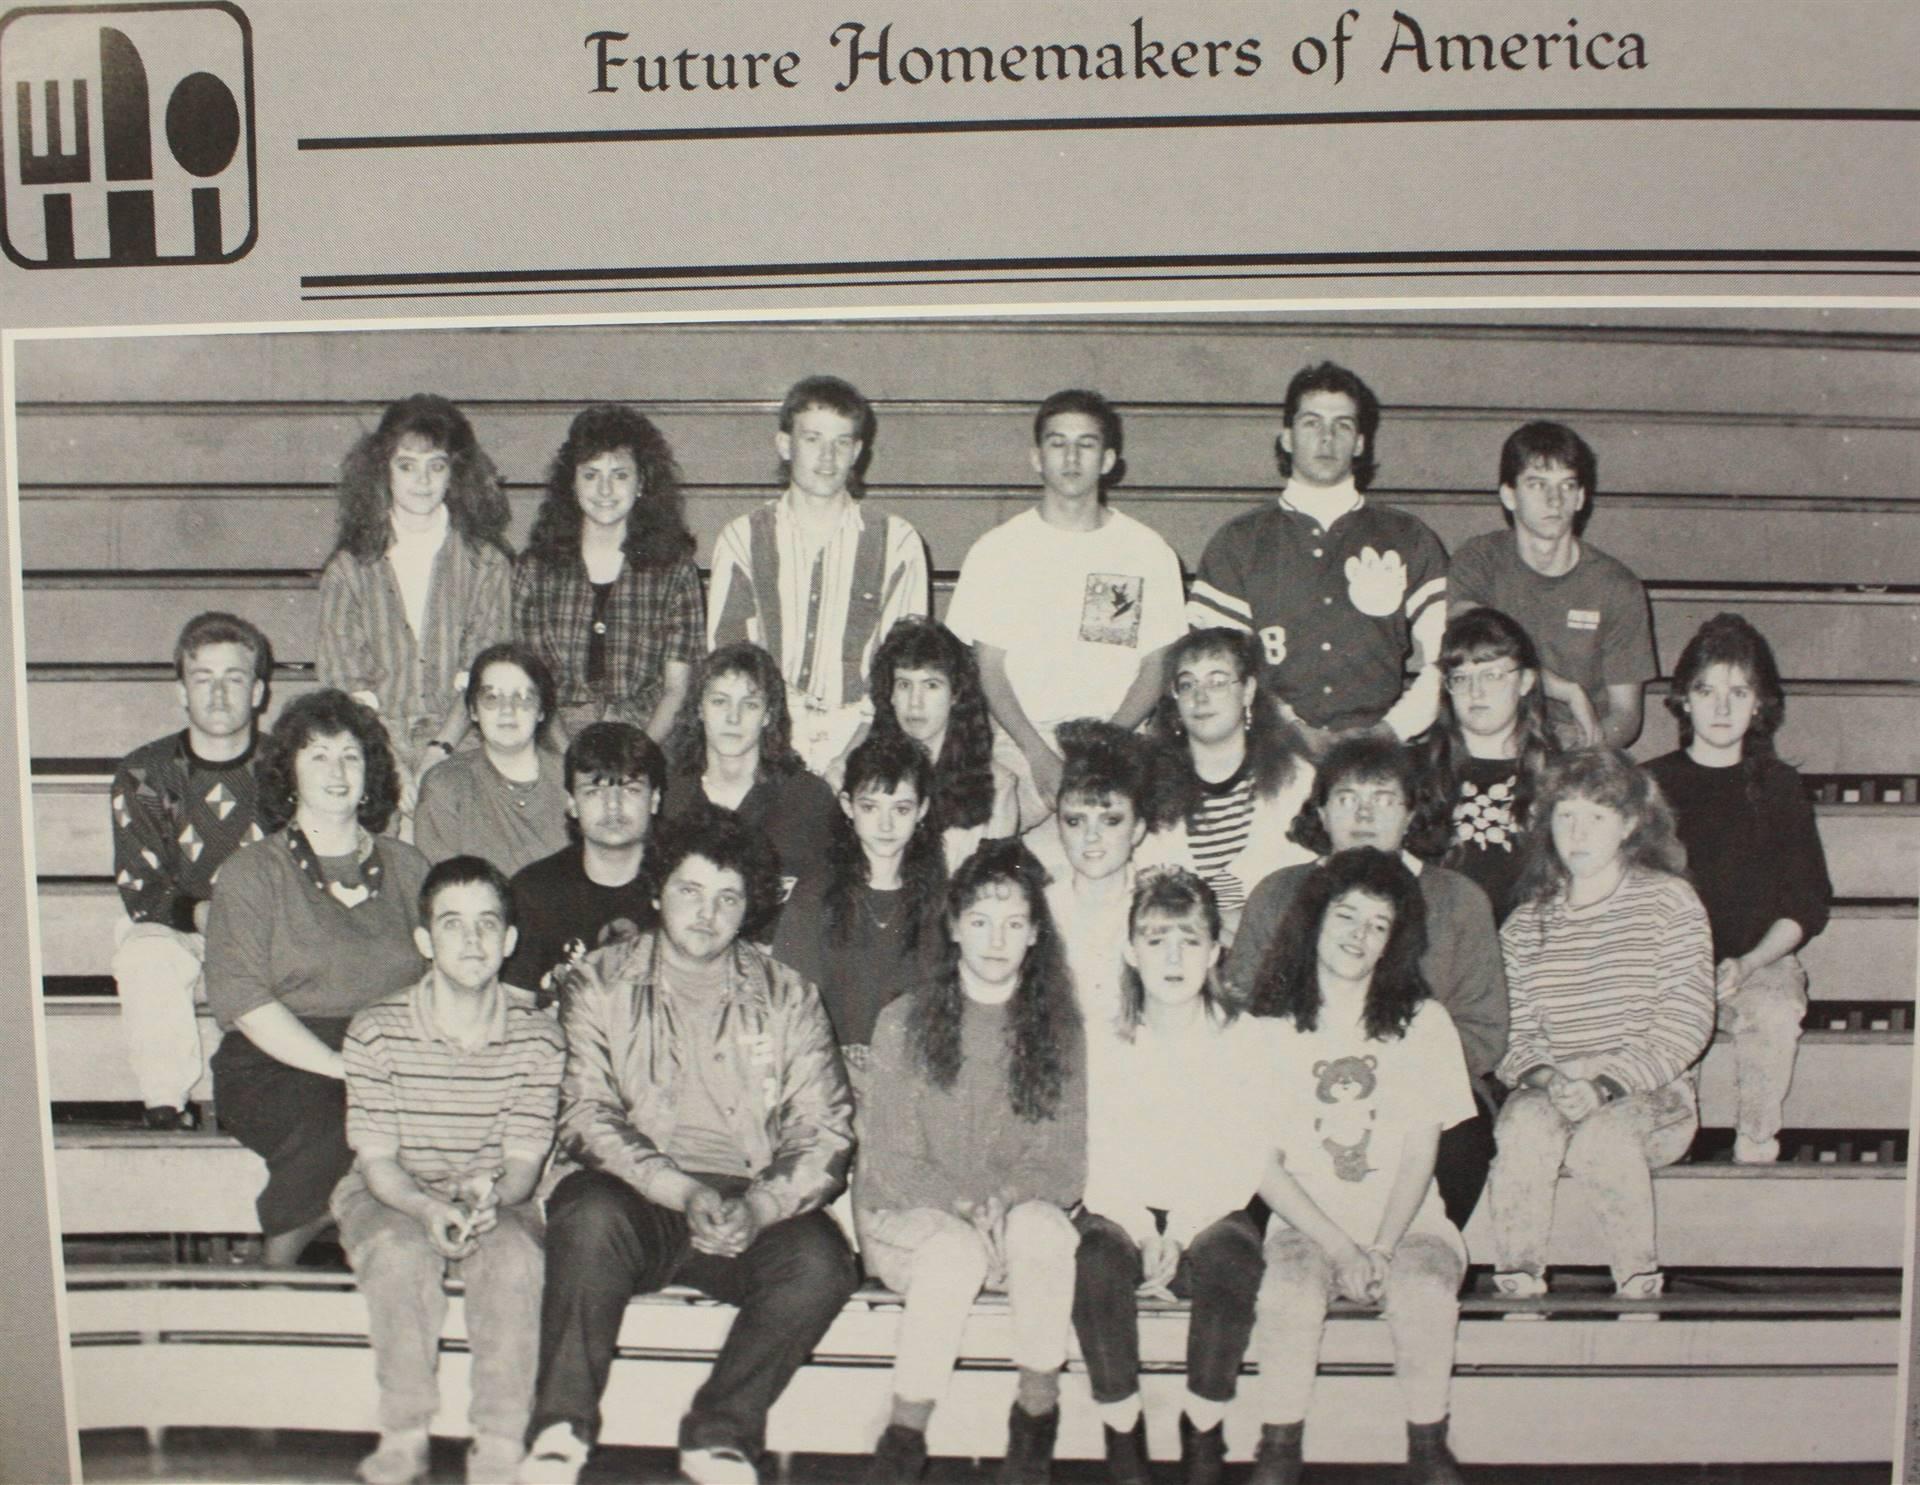 1991 Future Homemakers of America